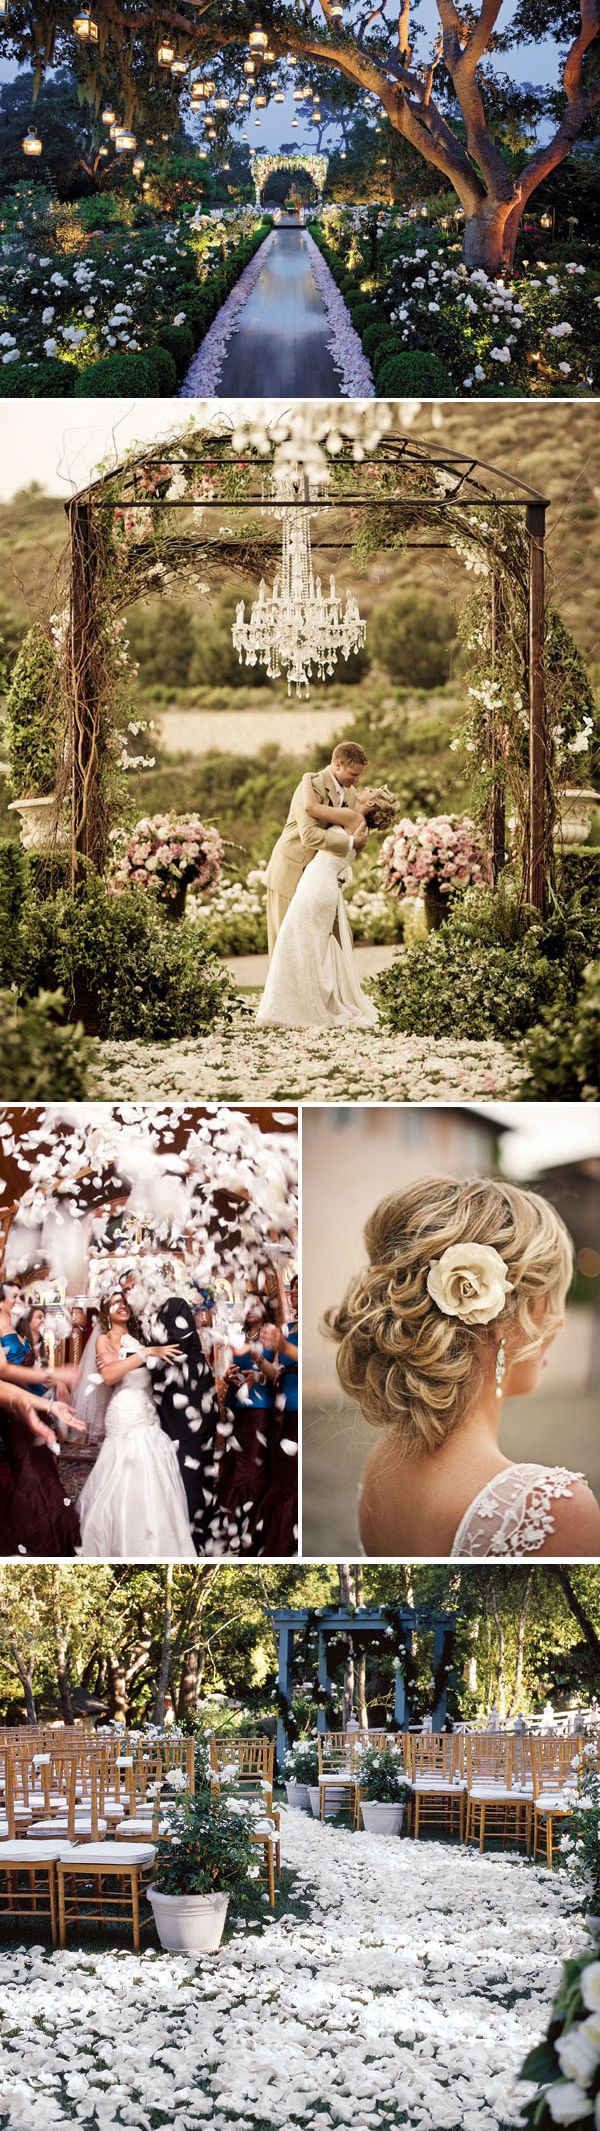 5 ways to light your wedding receptions evening wedding